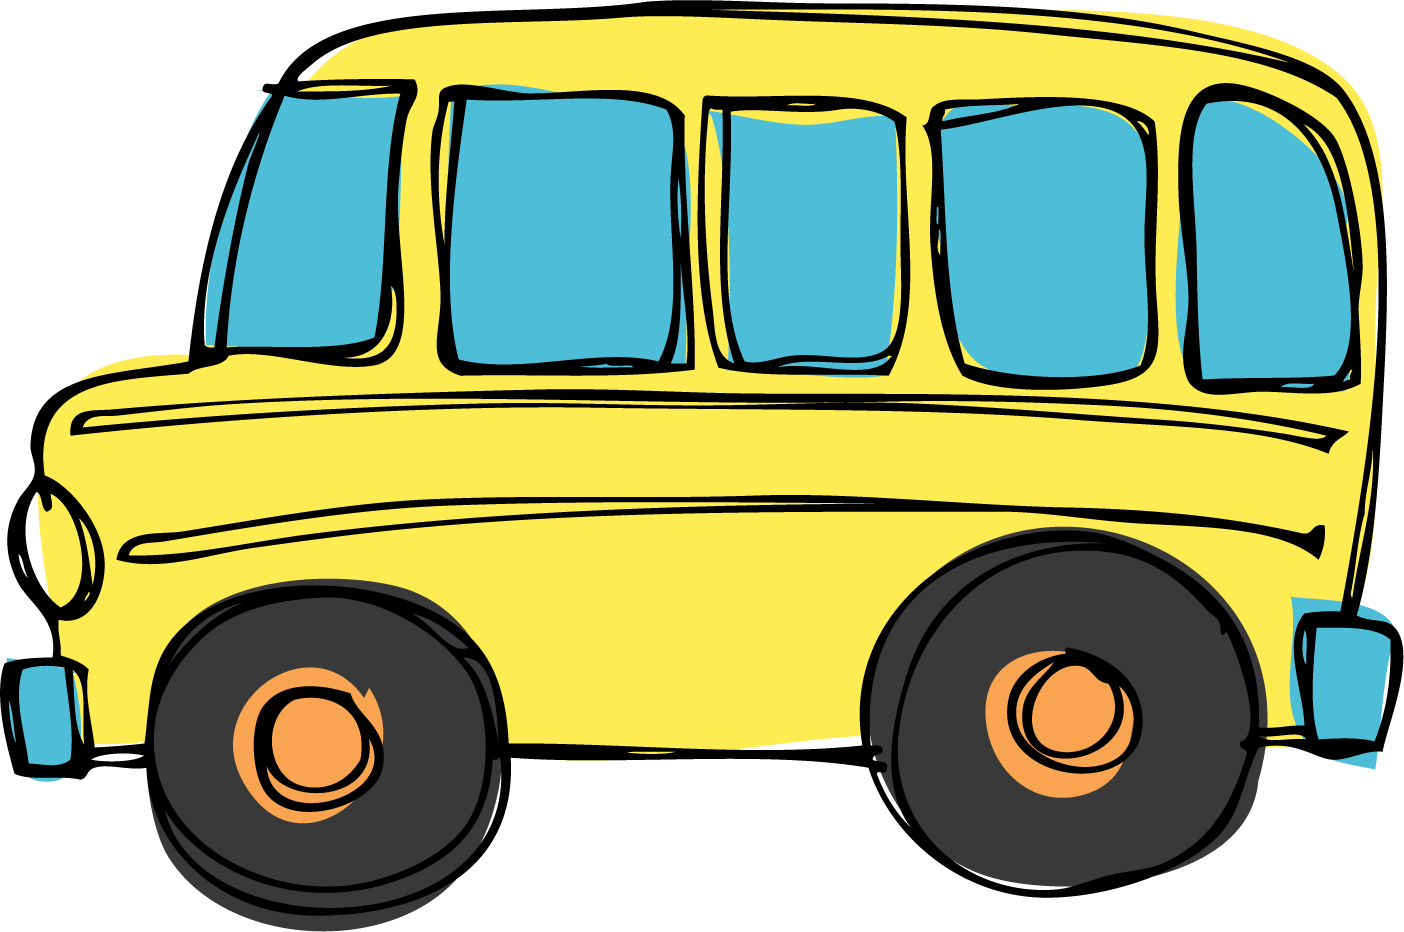 School bus clipart images 3 school clip art vector 2 4